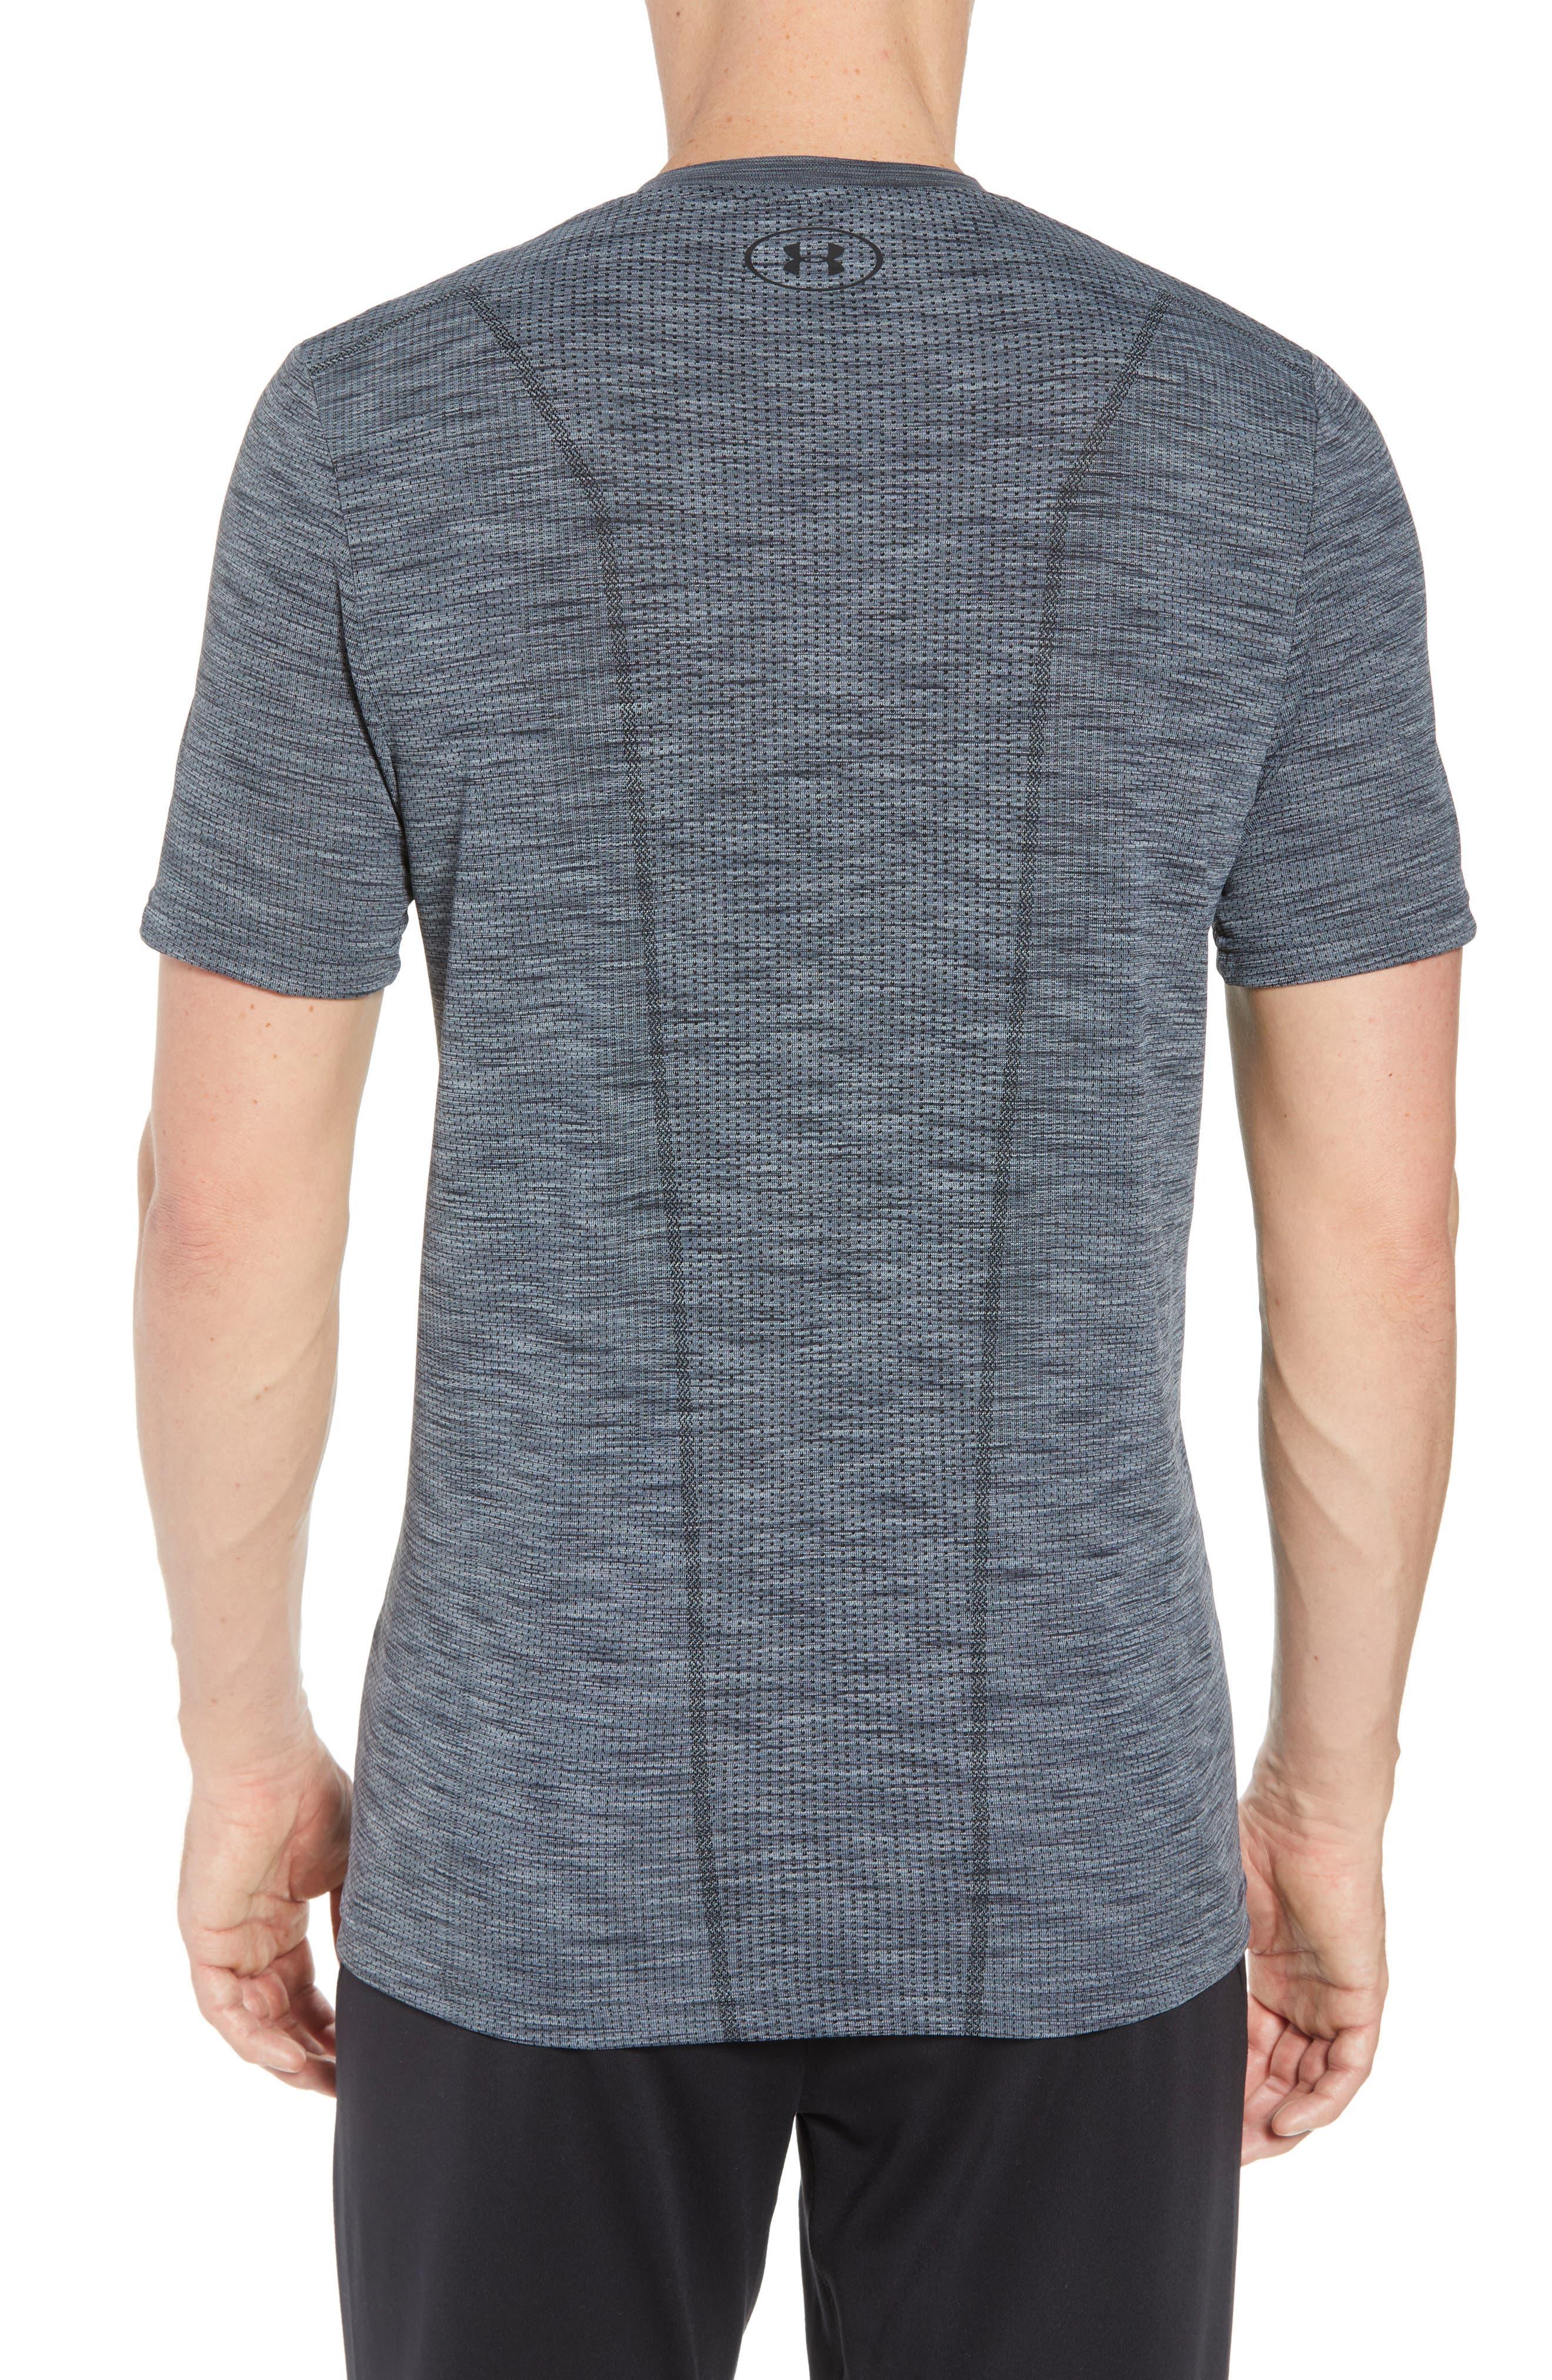 Regular Fit Threadborne T-Shirt,                             Alternate thumbnail 2, color,                             GRAPHITE/ BLACK